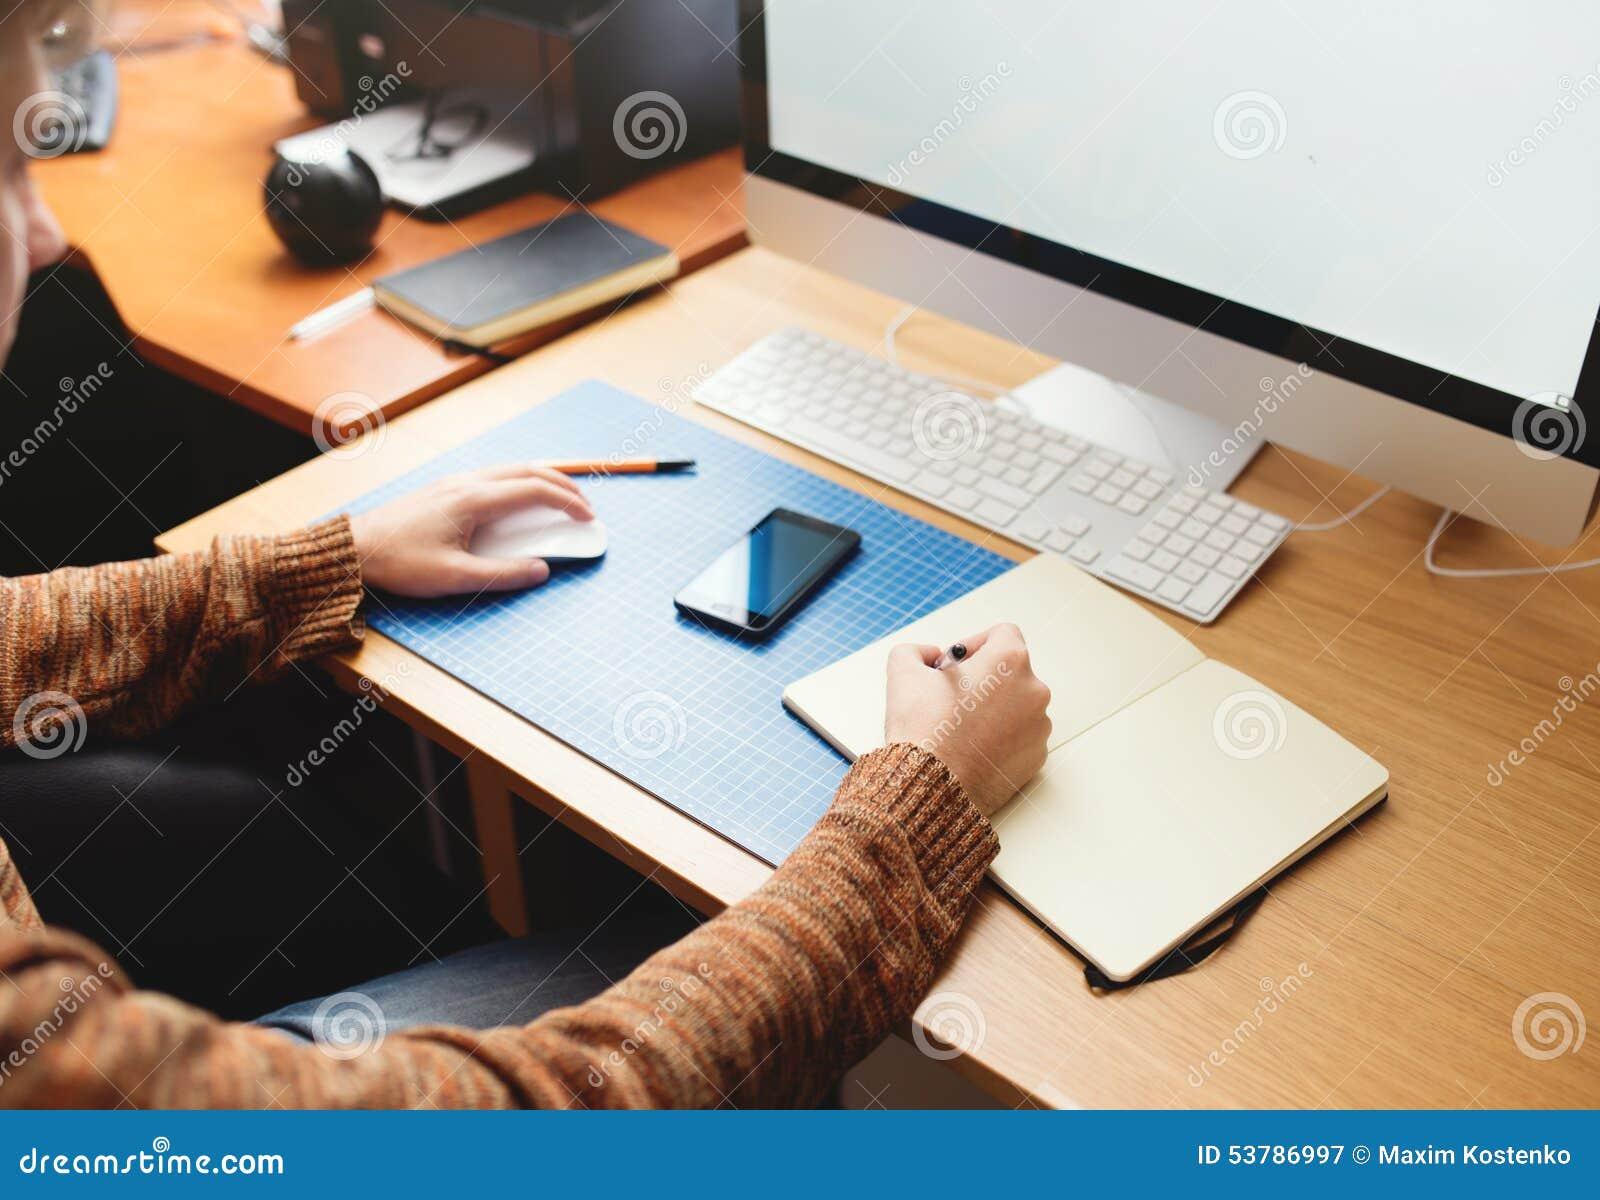 Freelance Developer And Designer Working At Home Stock Photo Image 53786997